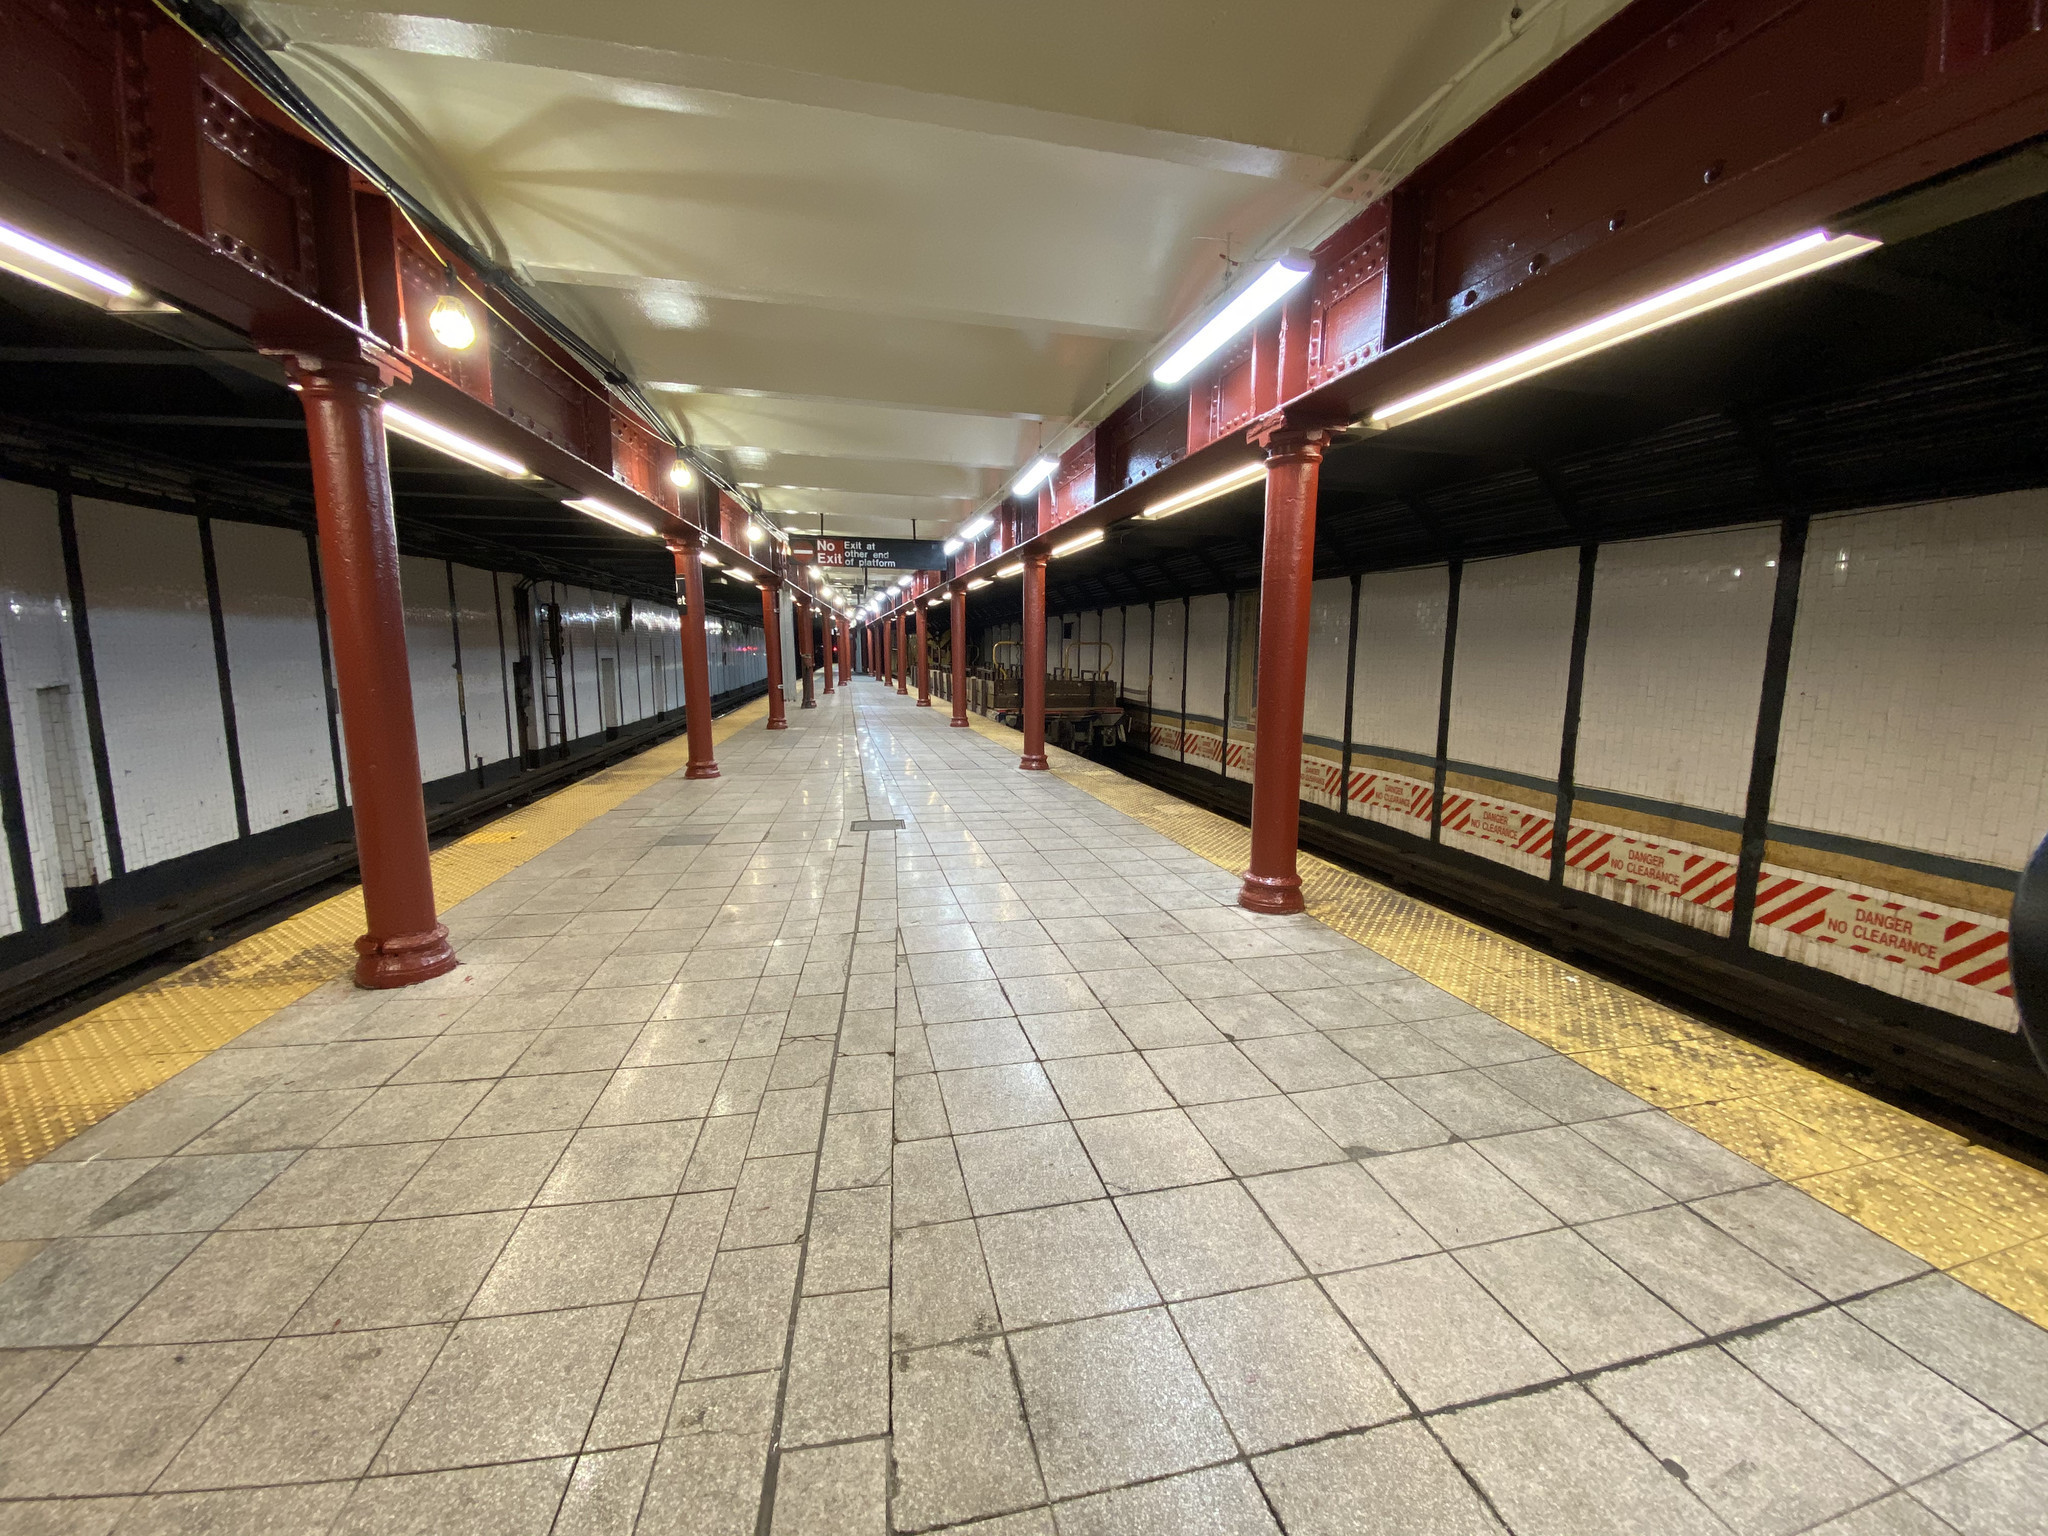 MTA reopens Harlem subway station 10 days after tragic fire